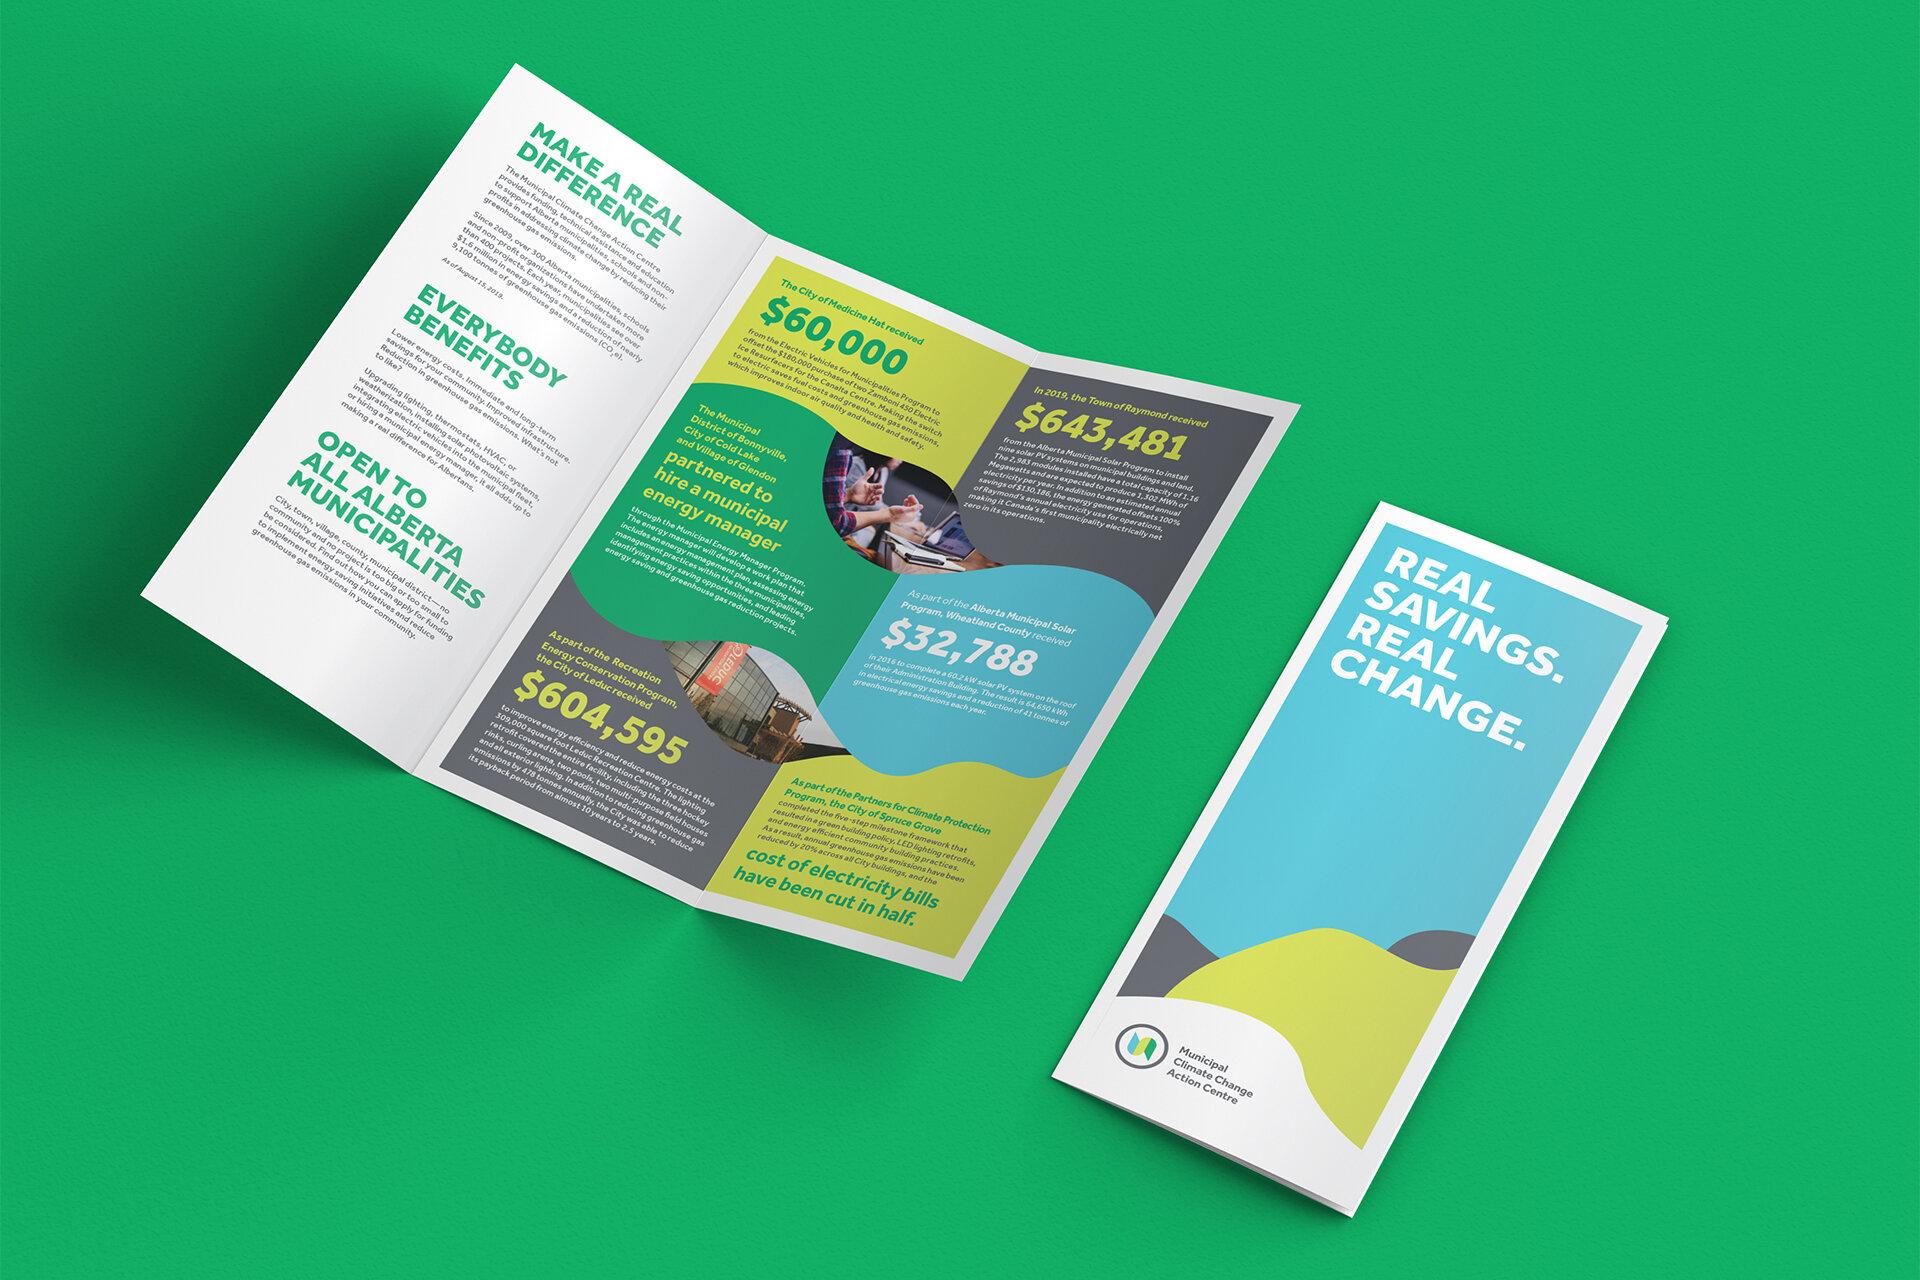 MCCAC-Brochure-mockup copy.jpg